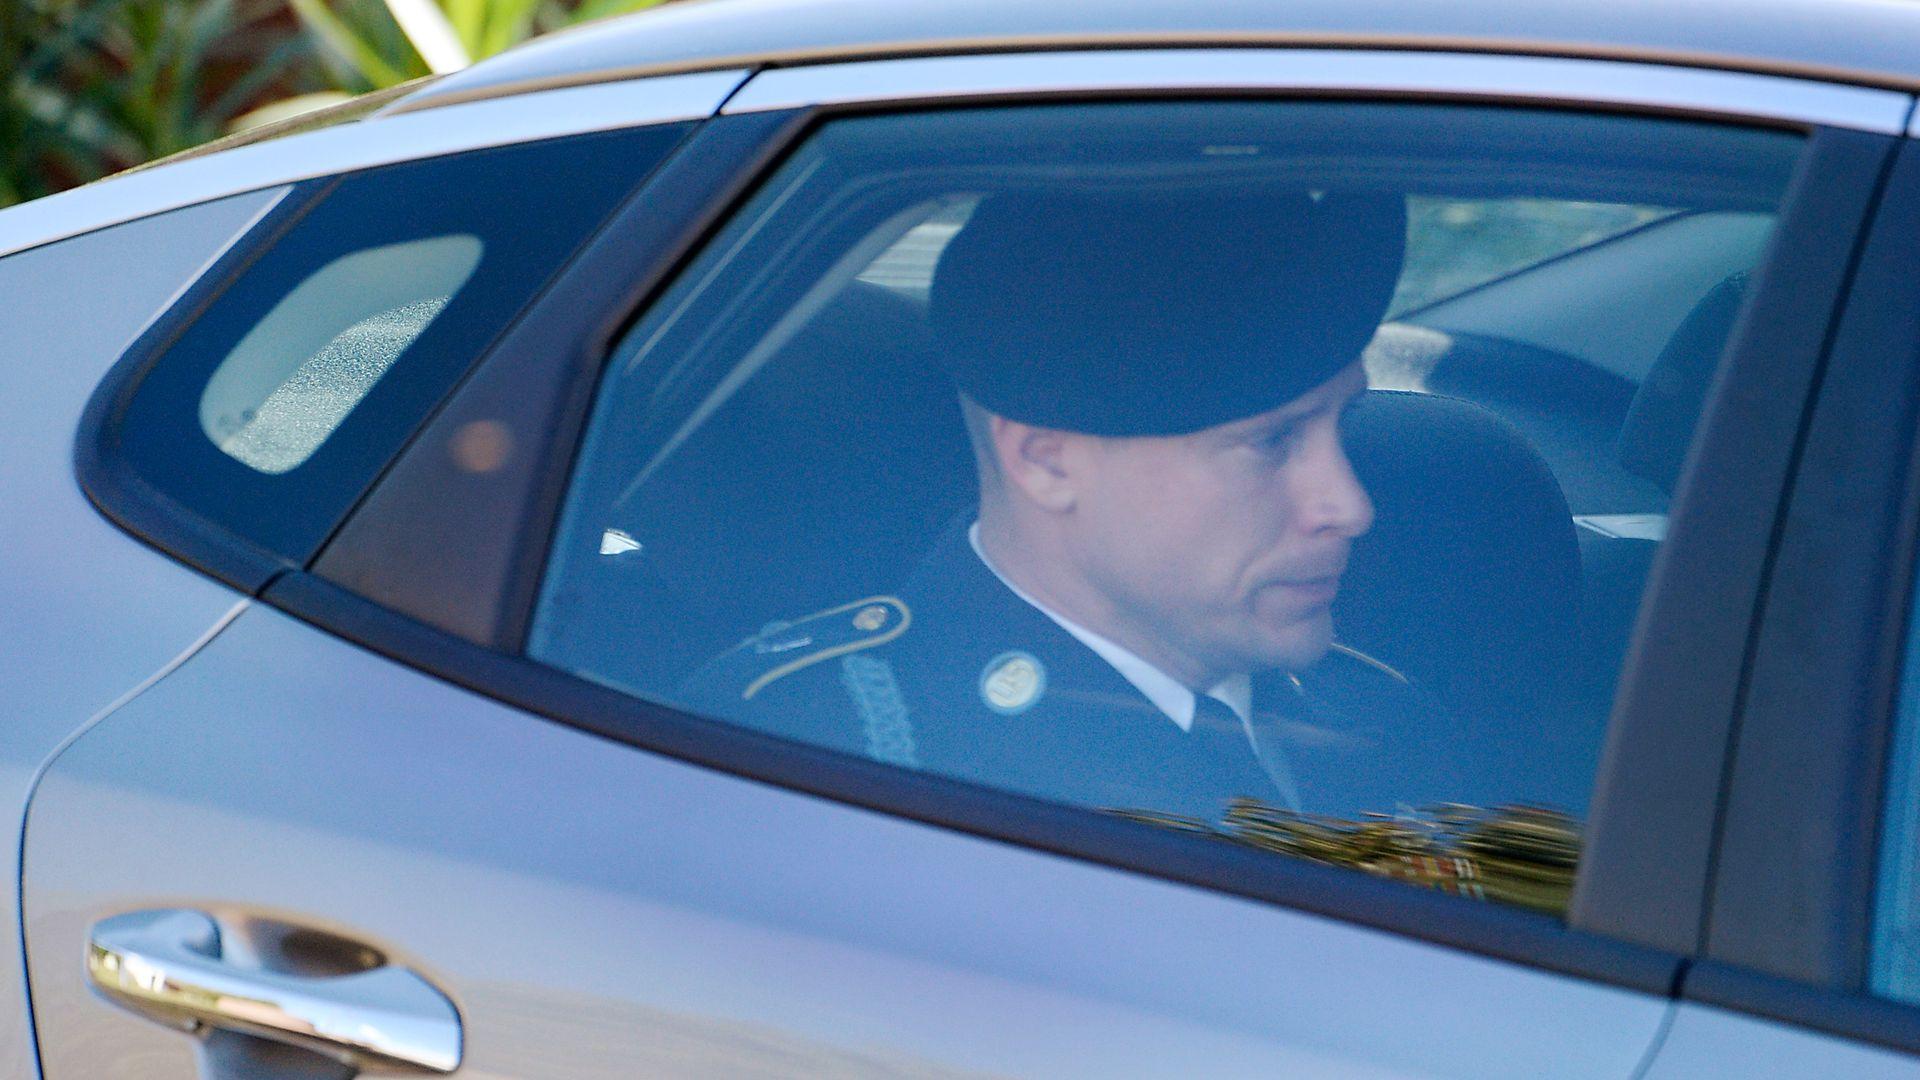 Bowe Bergdahl in a car.